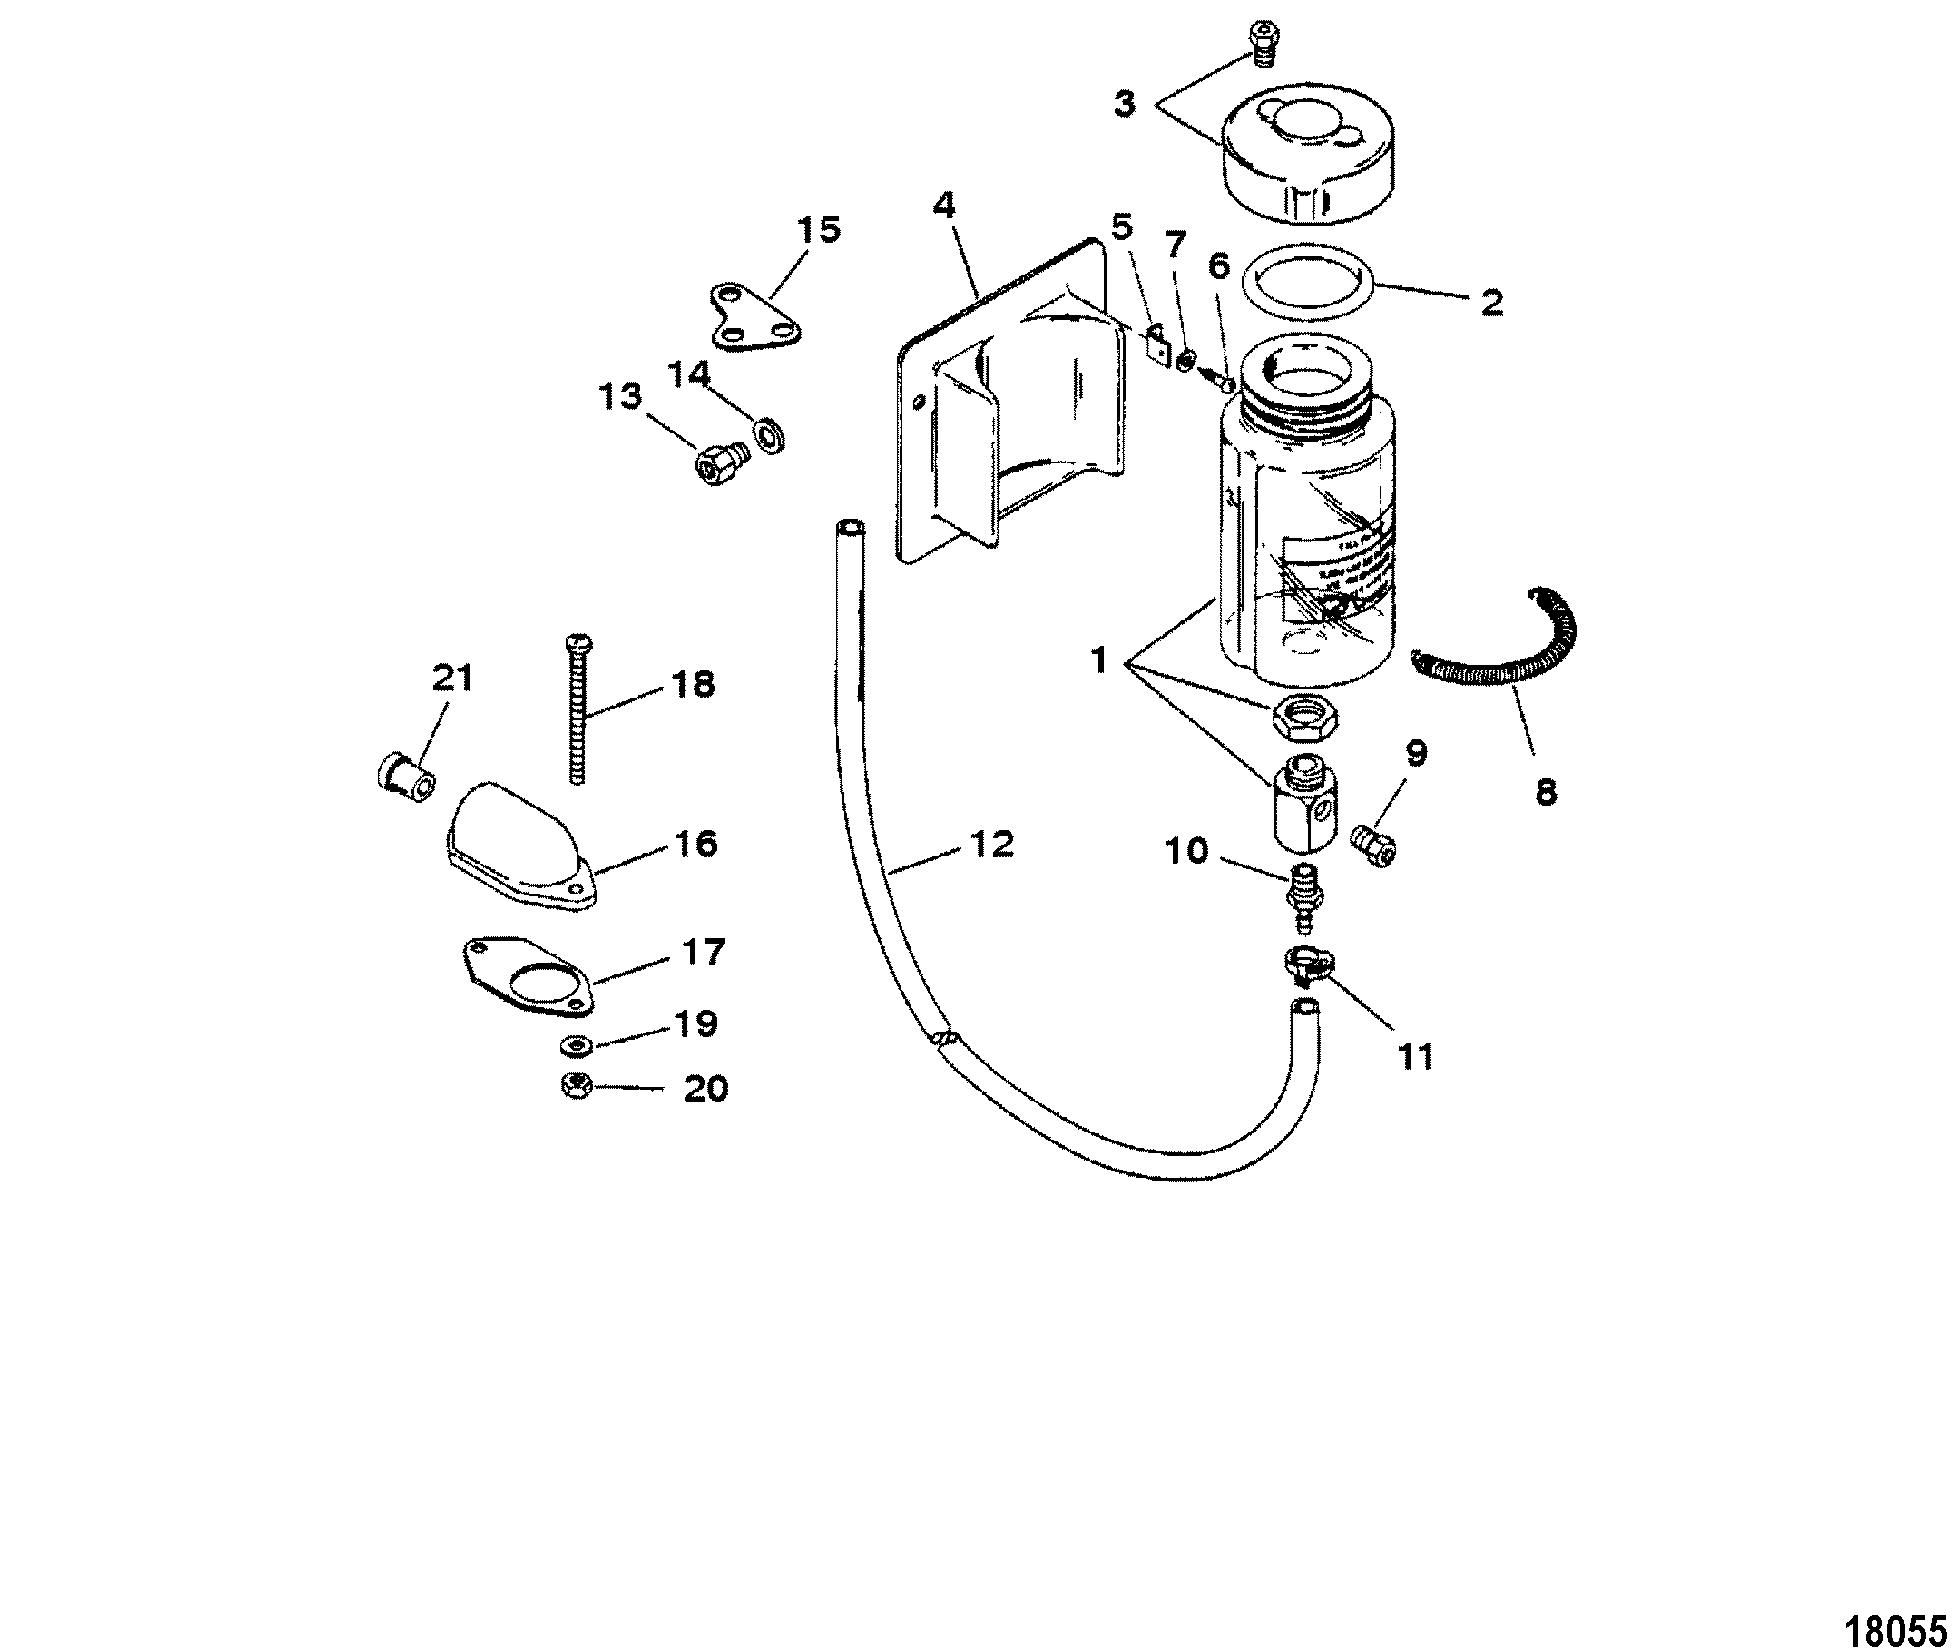 Oil Reservoir Assembly 69622A 7 FOR FUEL/OIL TANKS, LINES